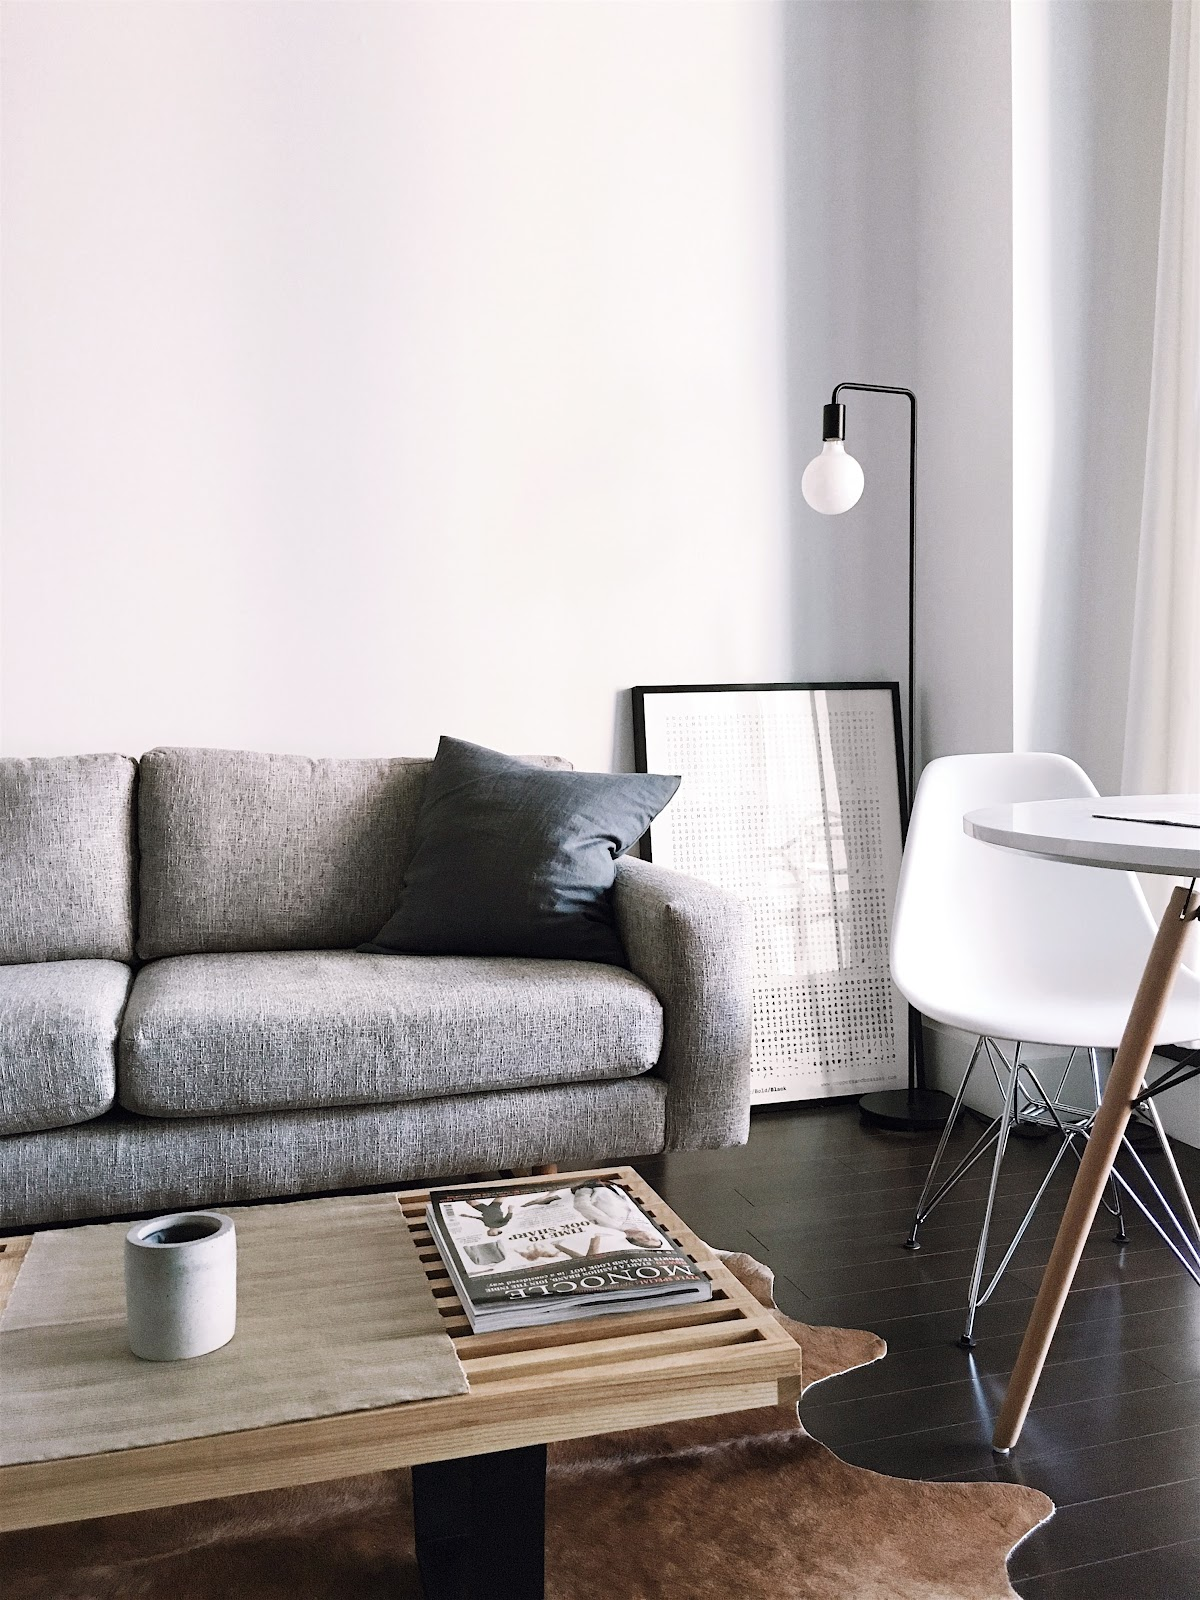 Desain scandinavian yang minimalis - source: unsplash.com